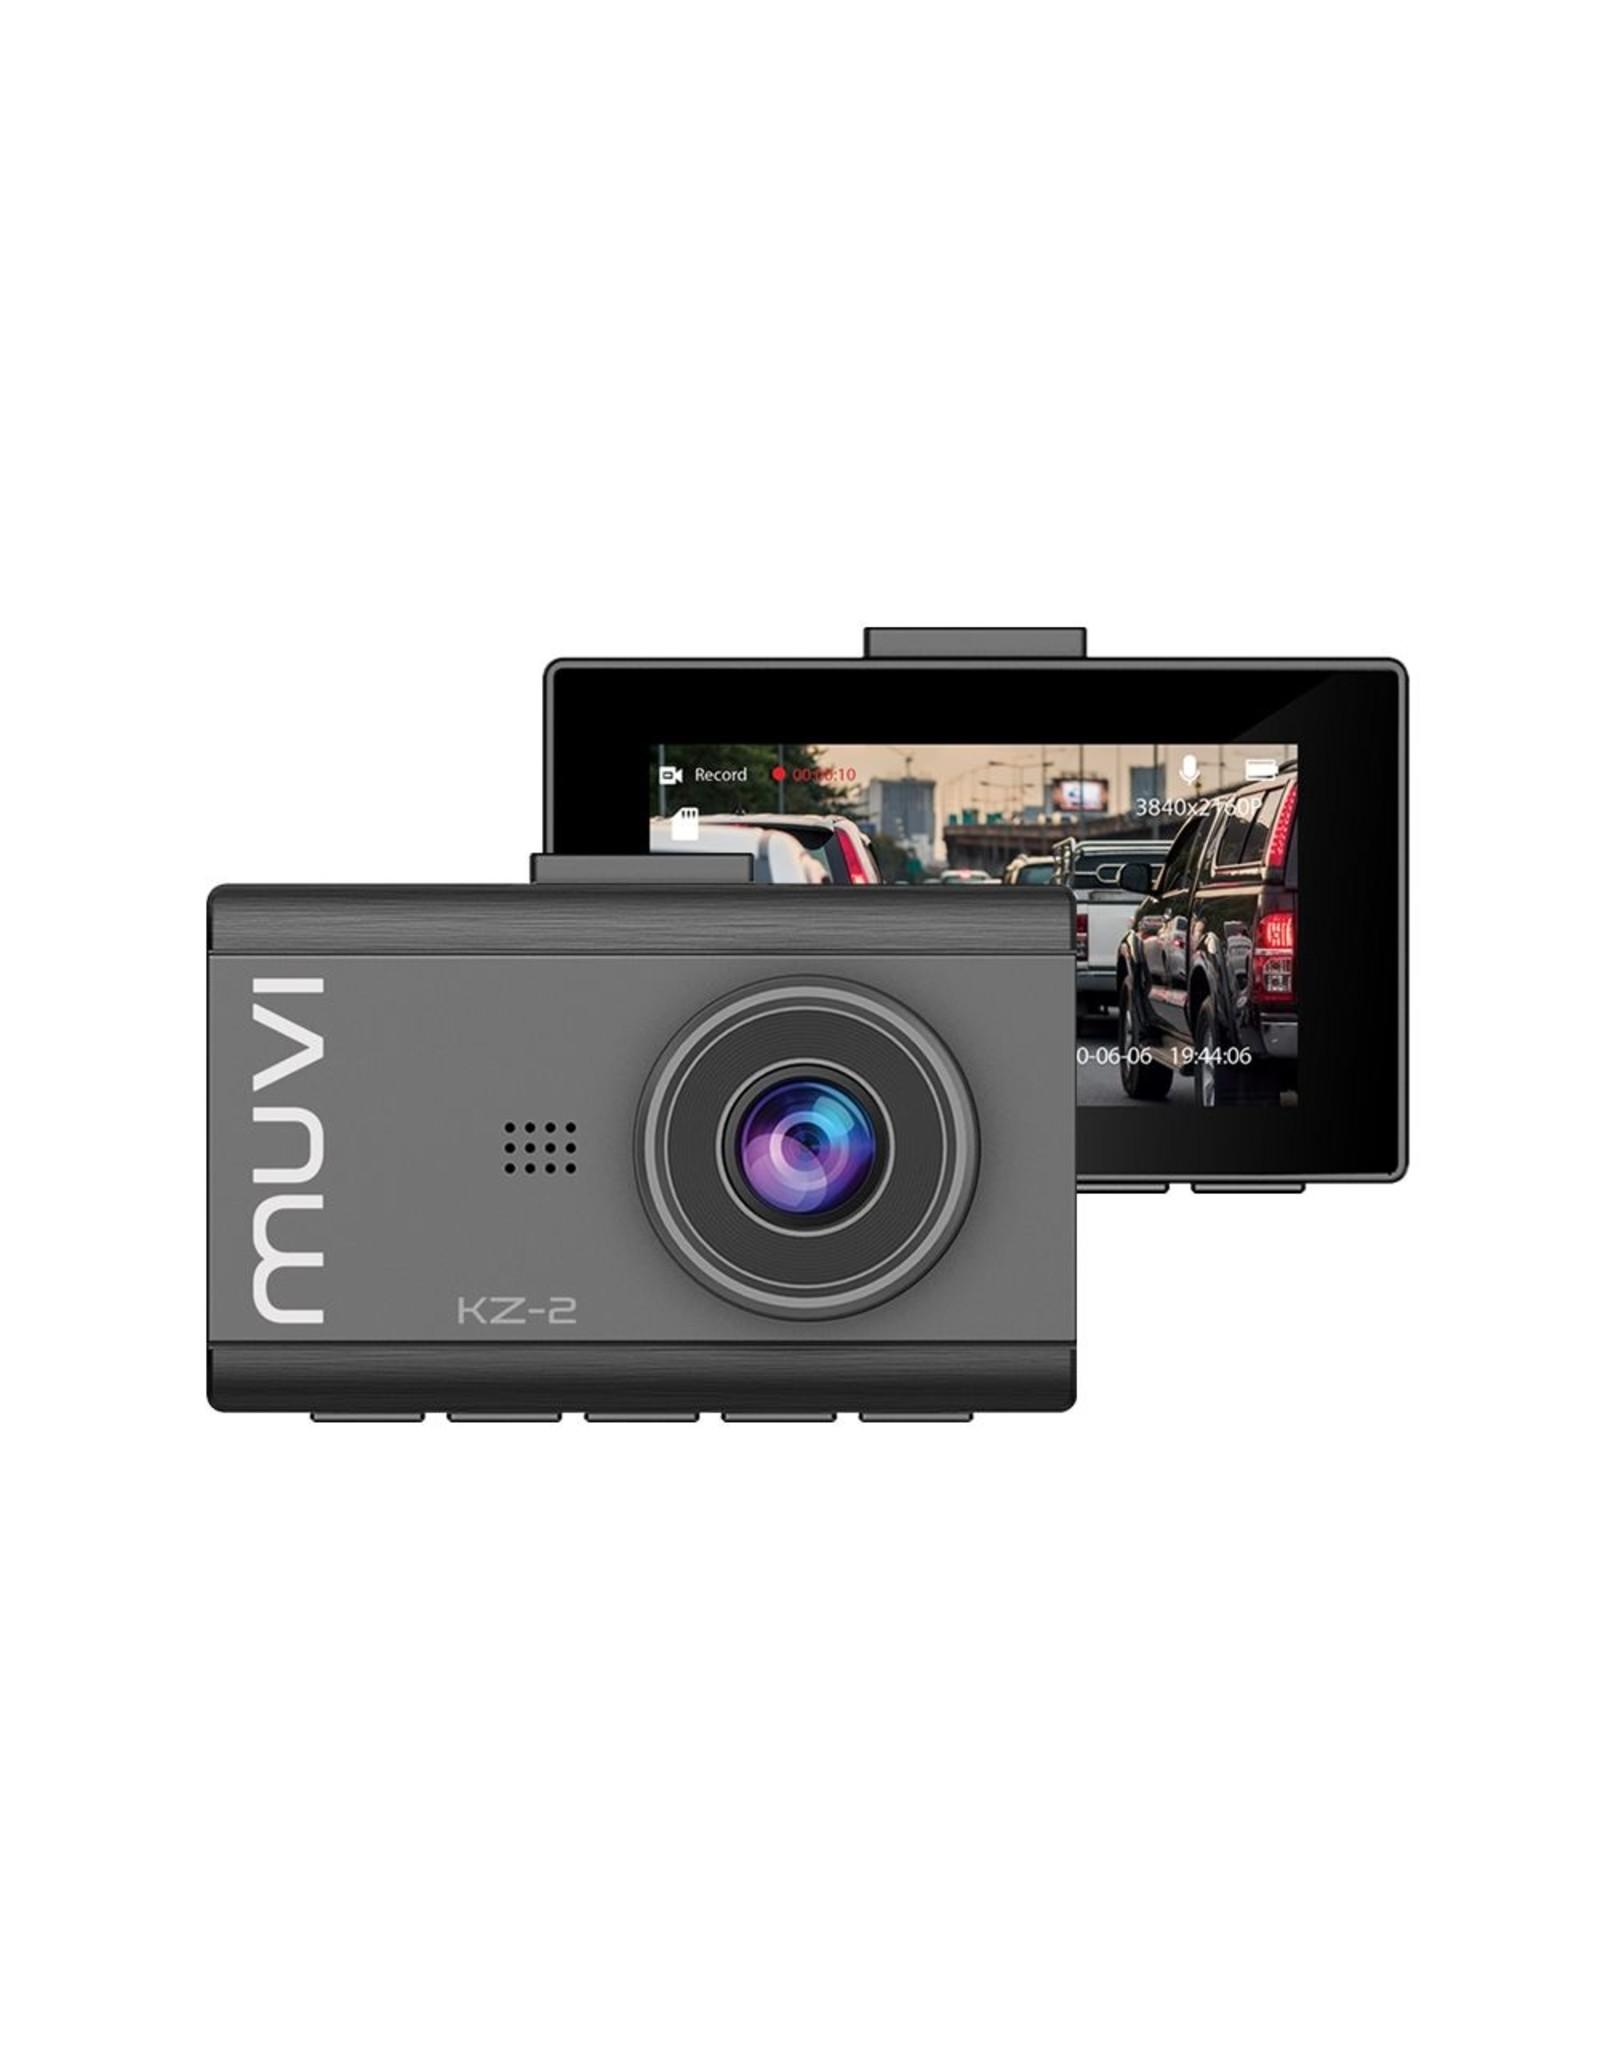 Veho Veho Muvi KZ-2 Pro Drivecam 4K Dashcam - (VDC-003-KZ2)